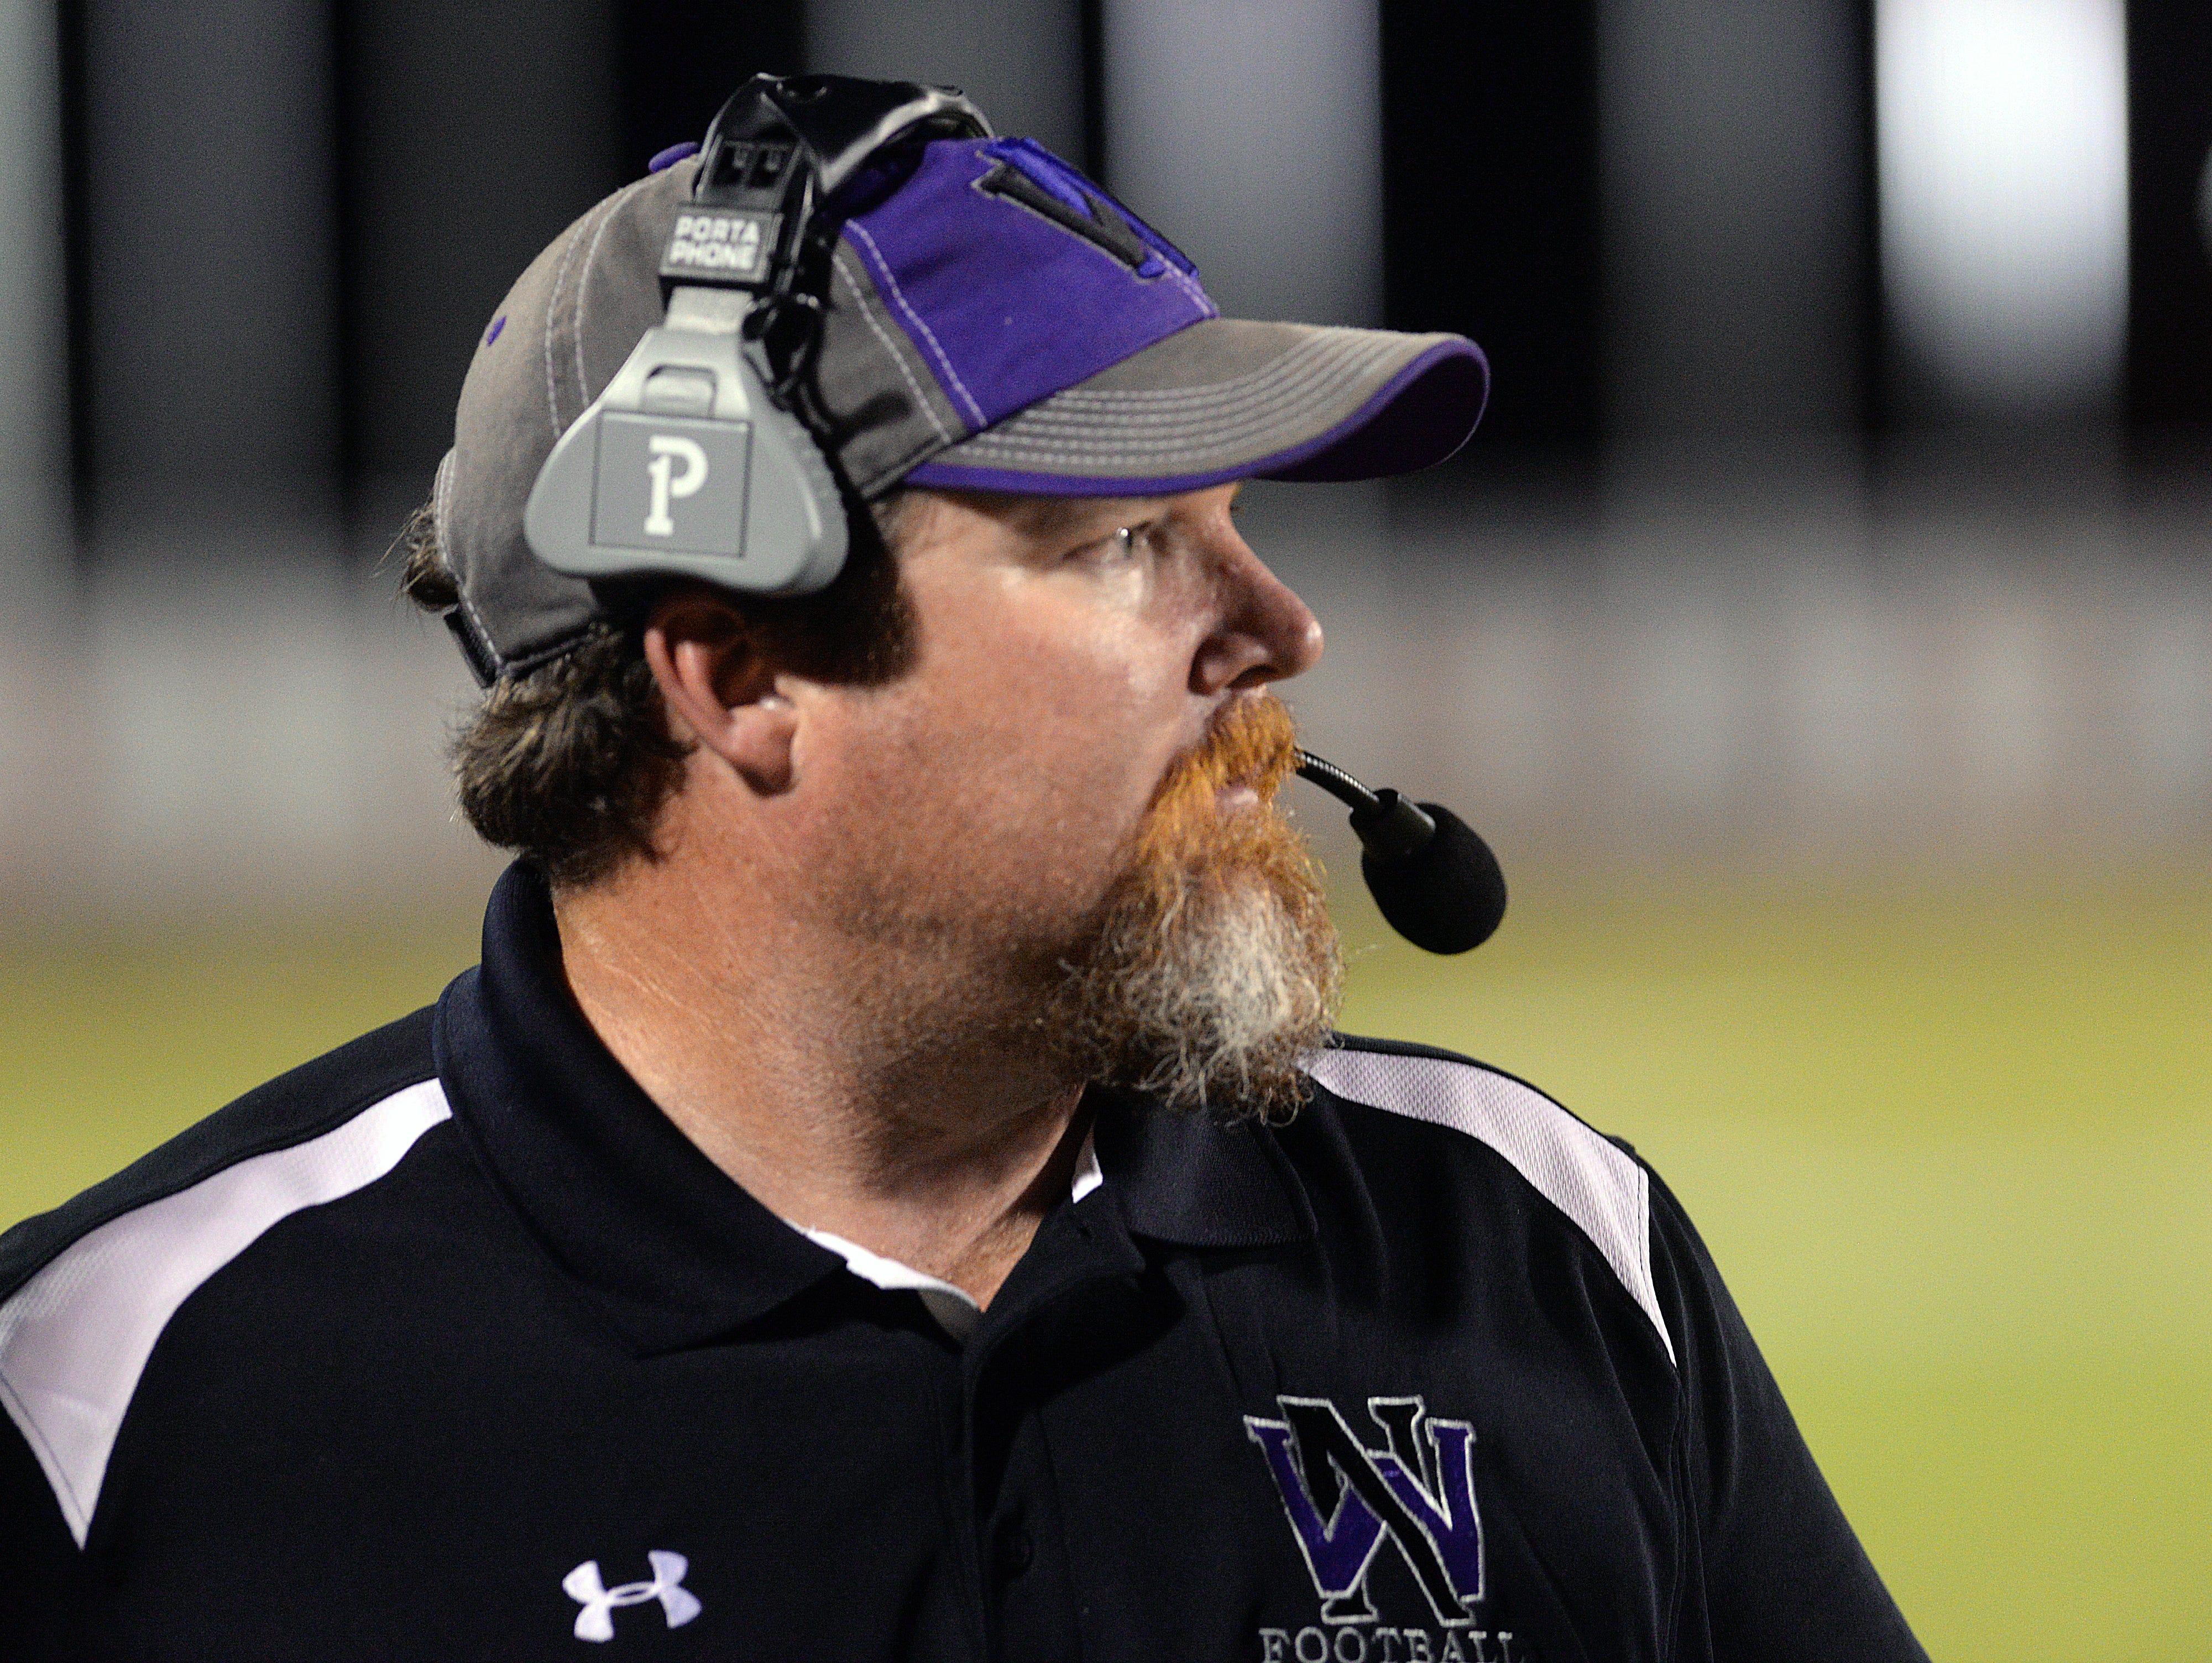 North Webster coach John Ware